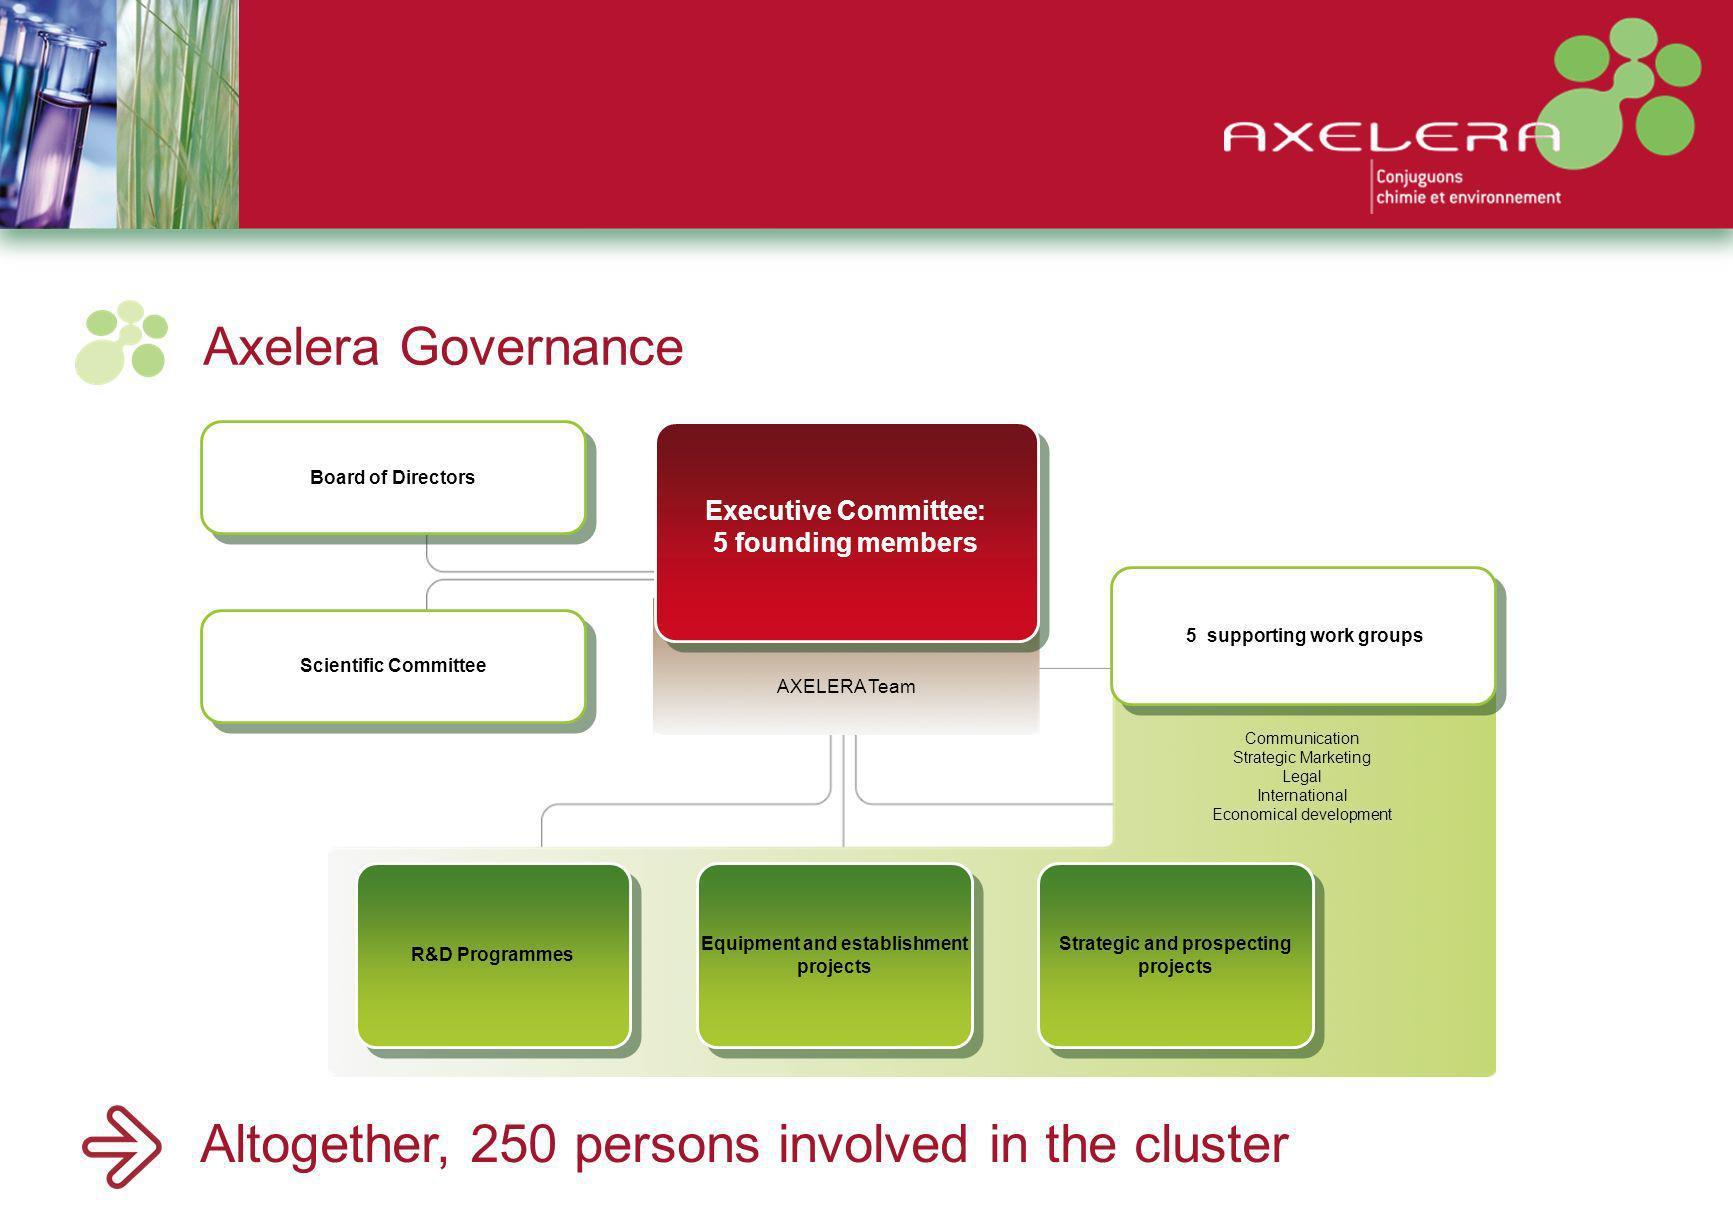 International development In 2007, Axelera announced its international strategy at POLLUTEC 2007.